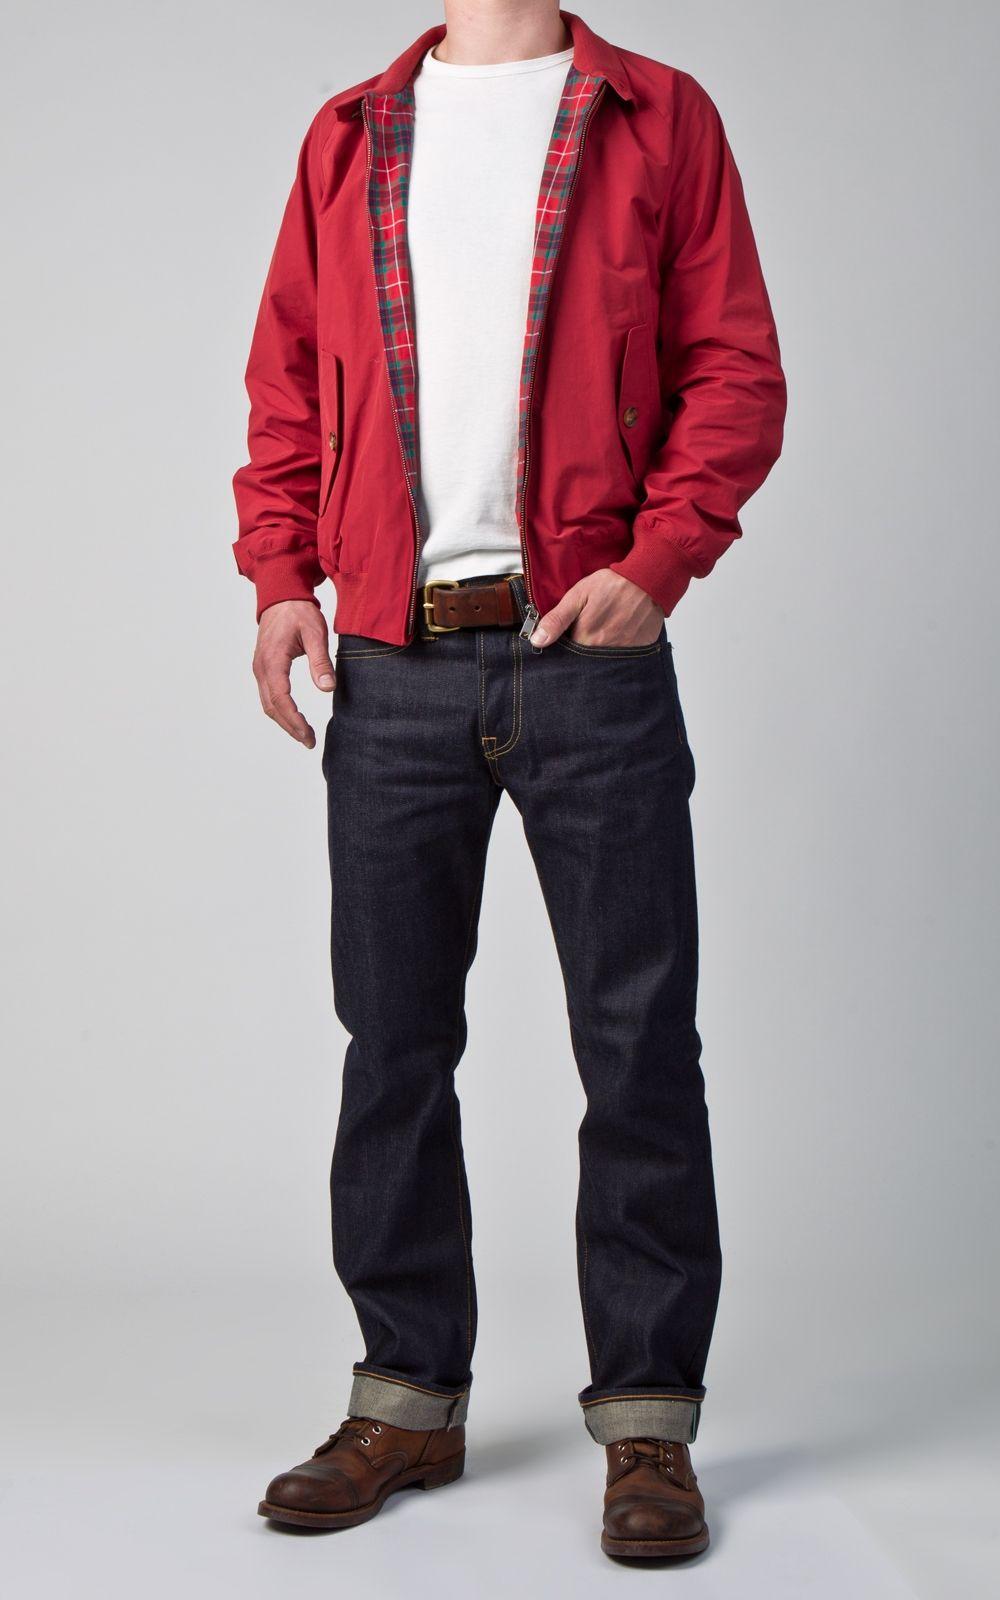 9468a711afa Baracuta G9 Original Harrington Jacket Dark Red Harrington Jacket